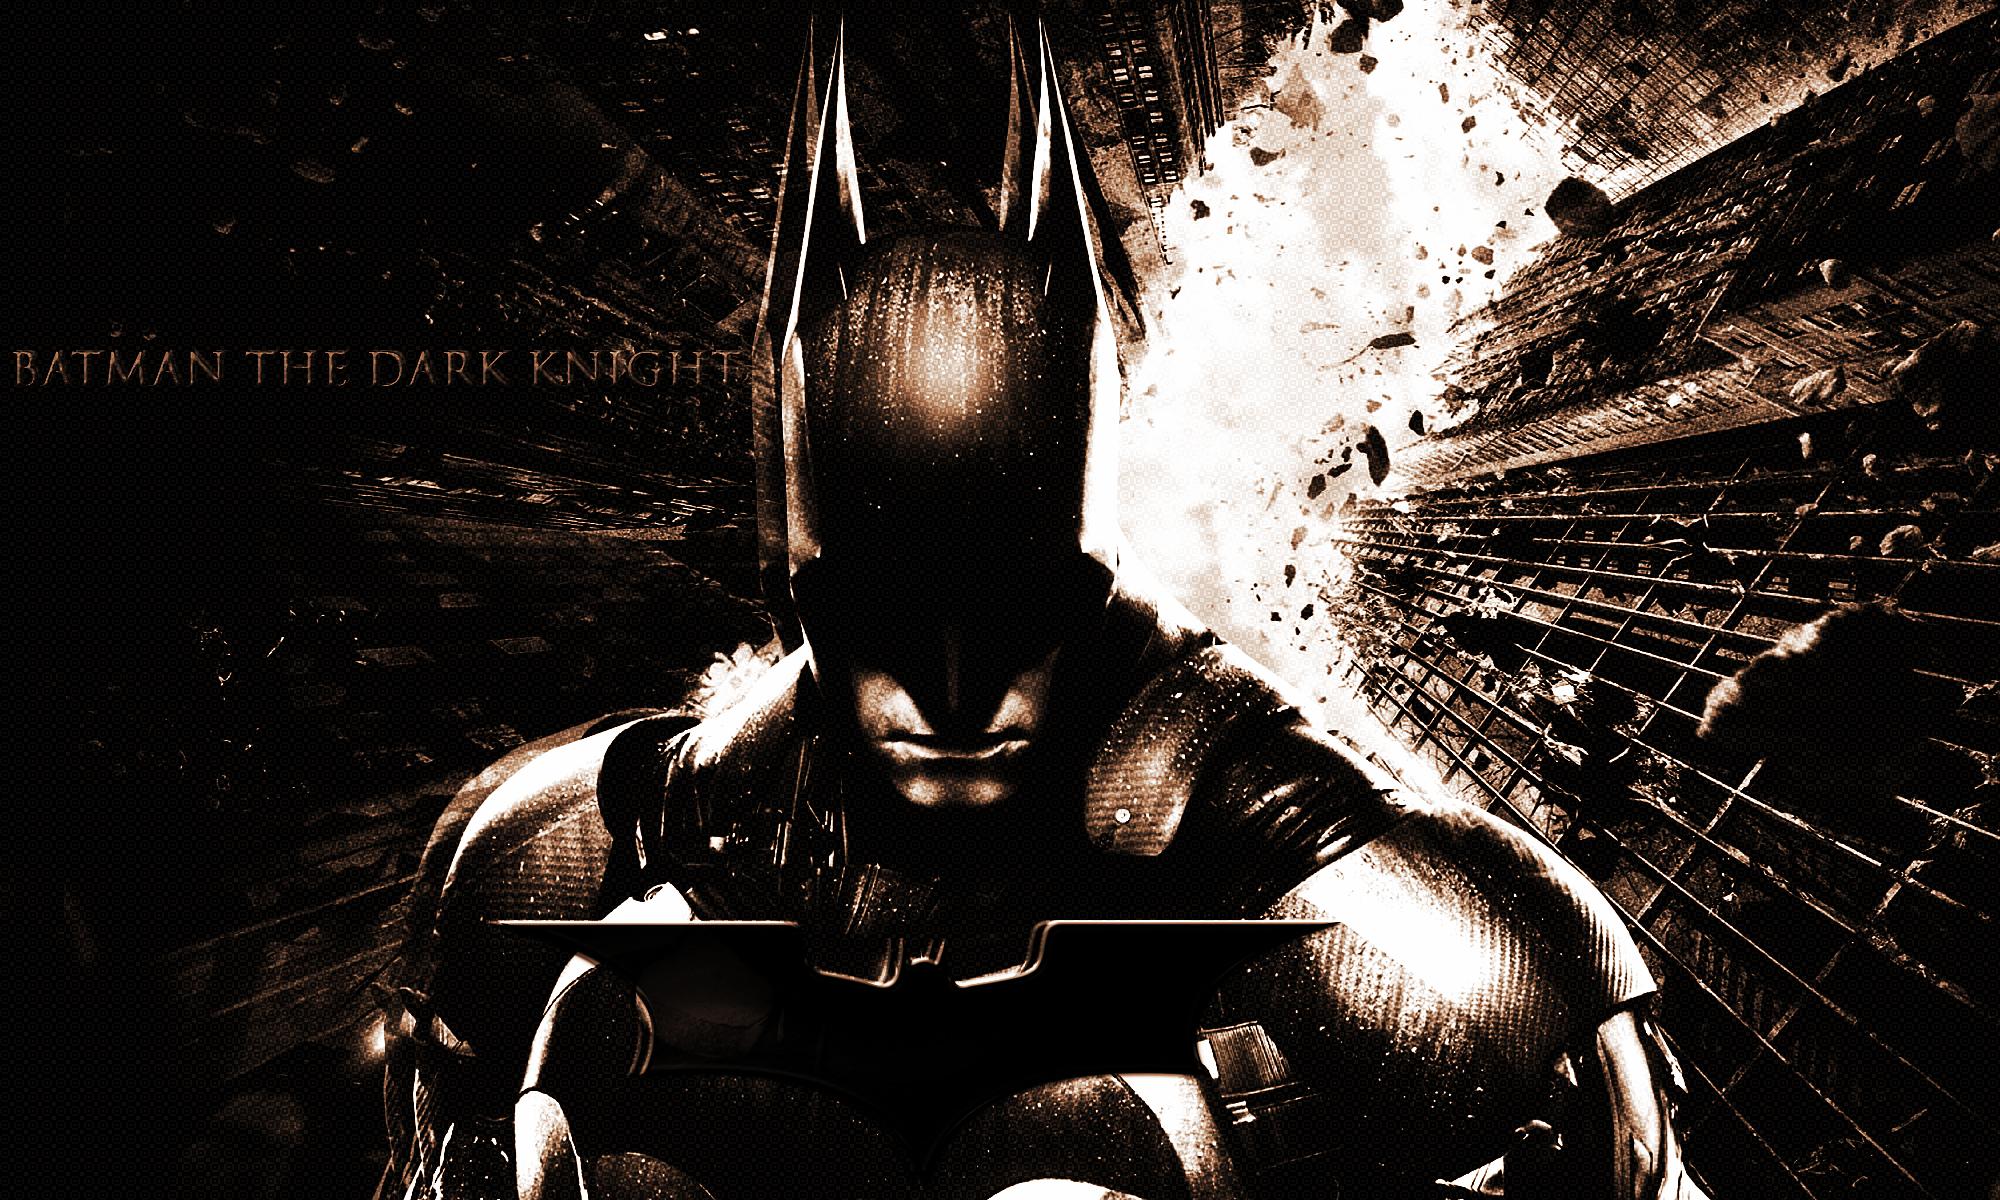 in thw dark batman wallpapers - photo #21